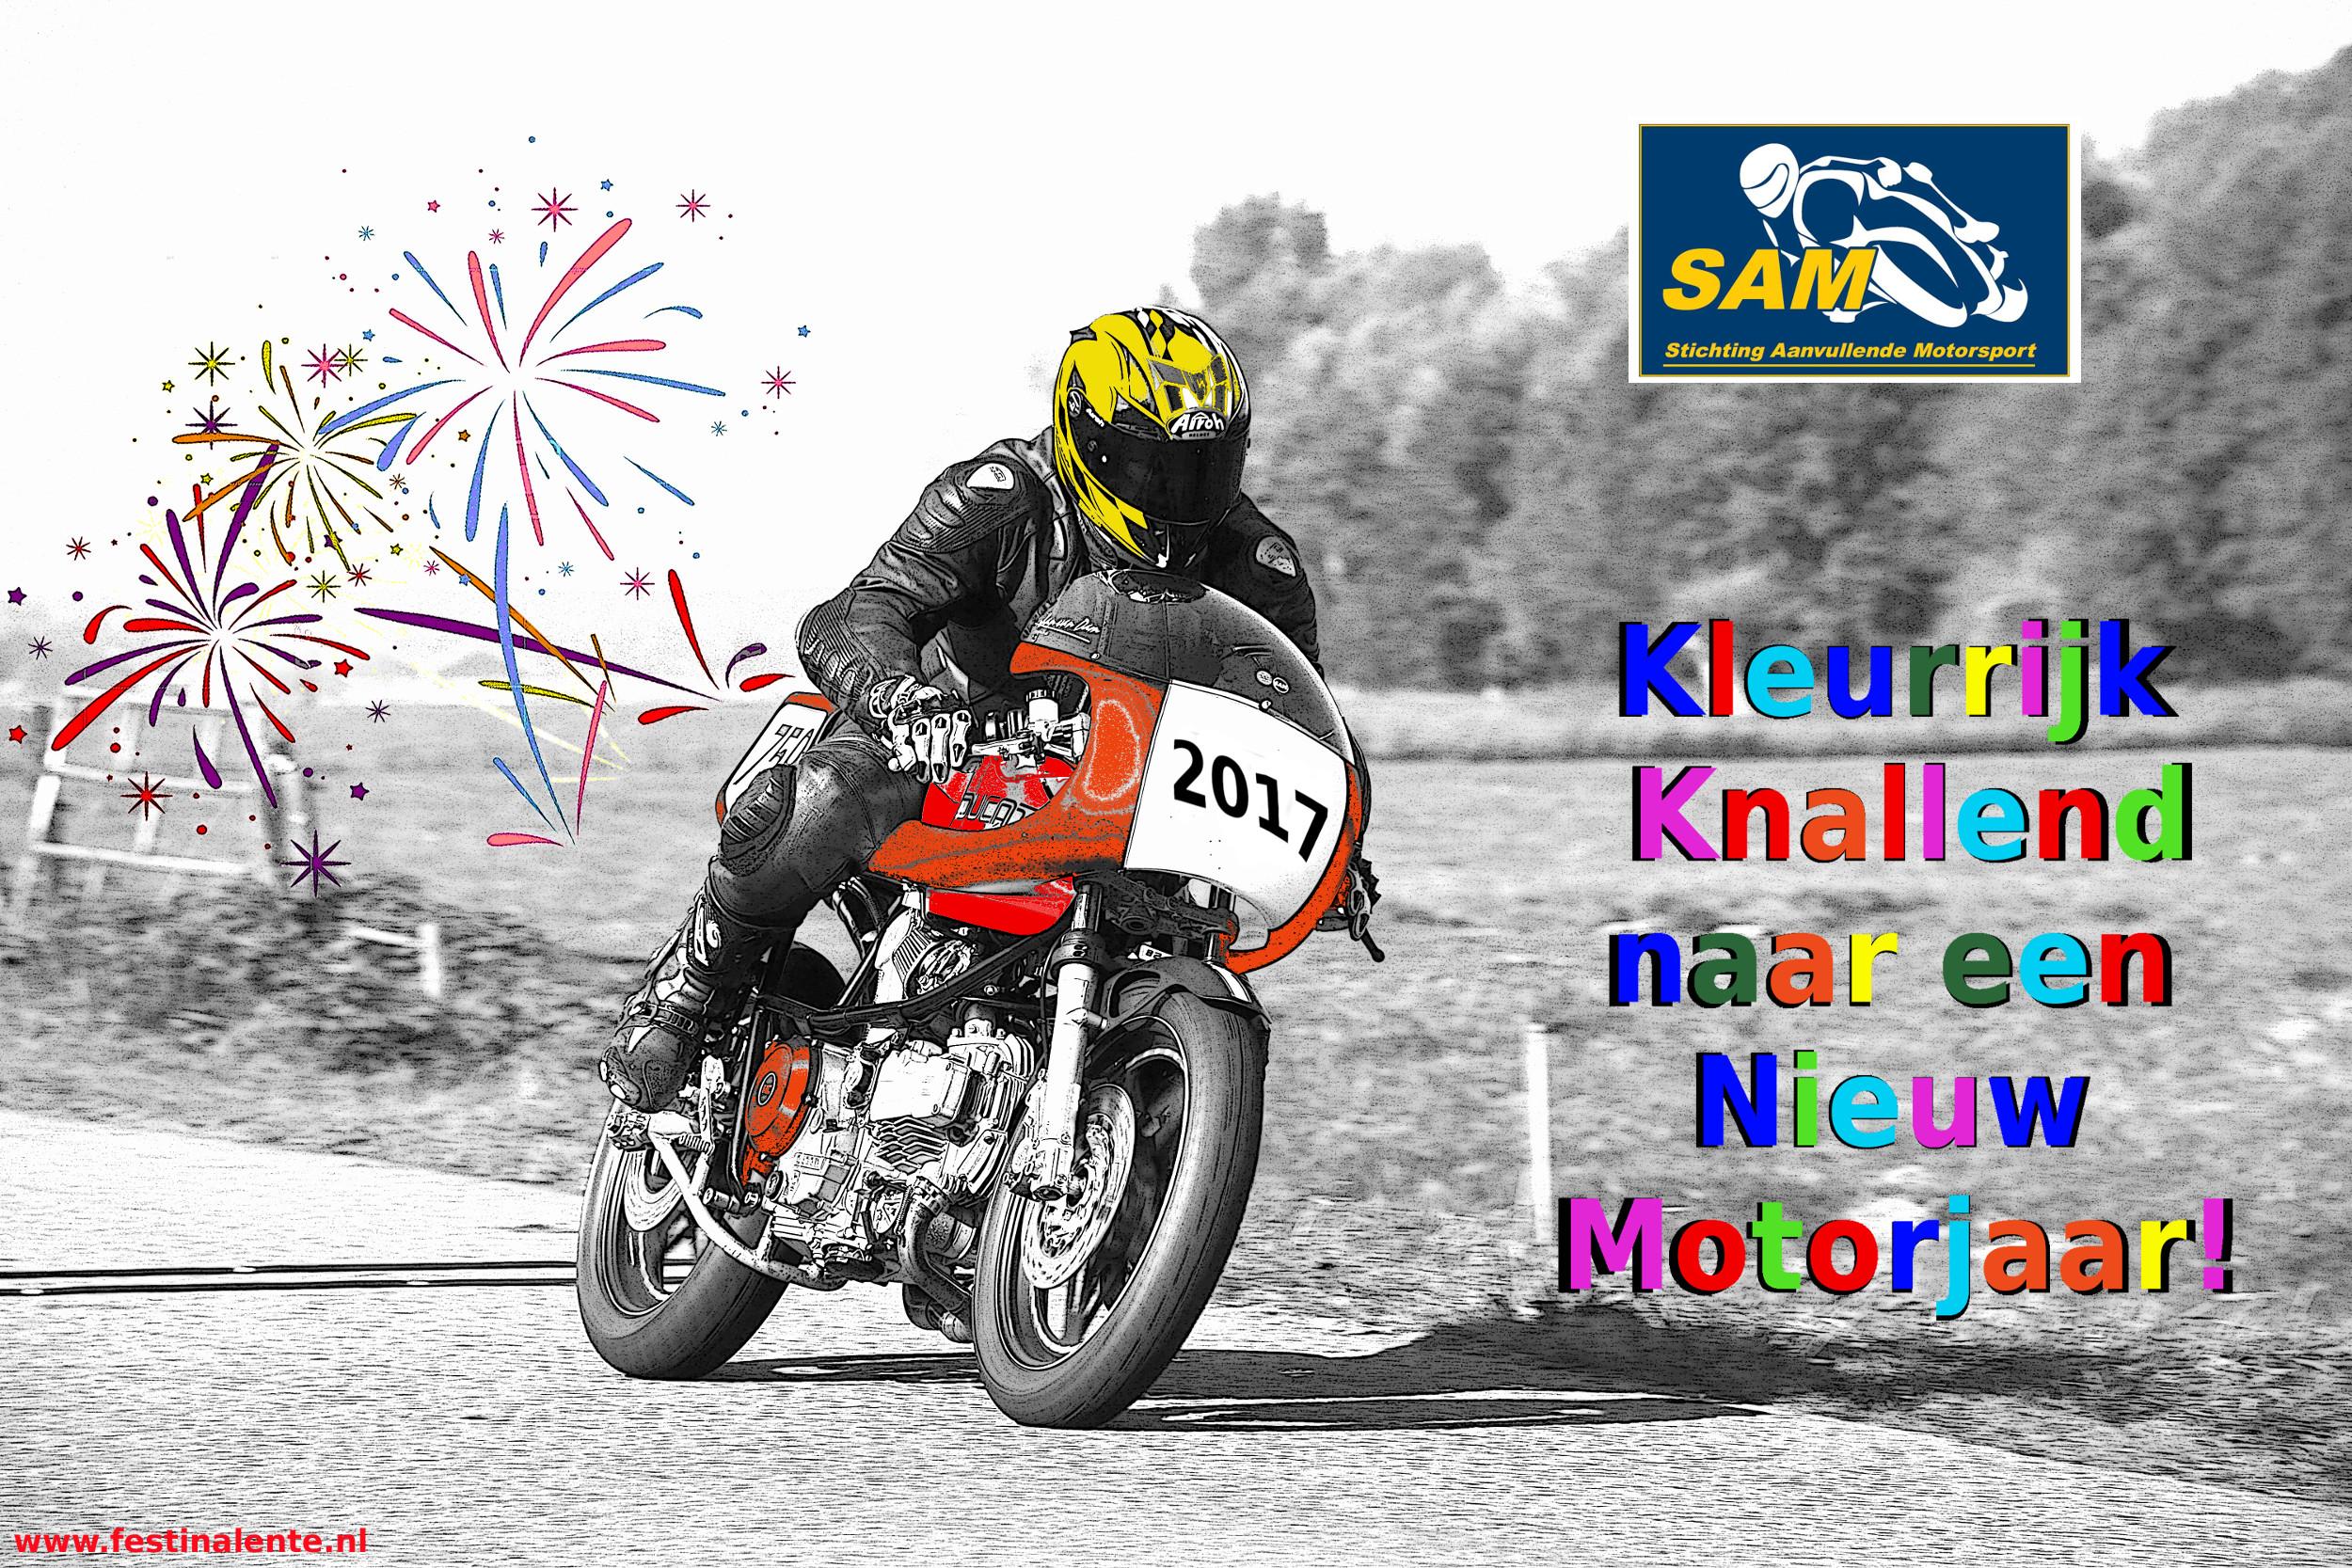 sam-nieuwjaar-2017-2500-2